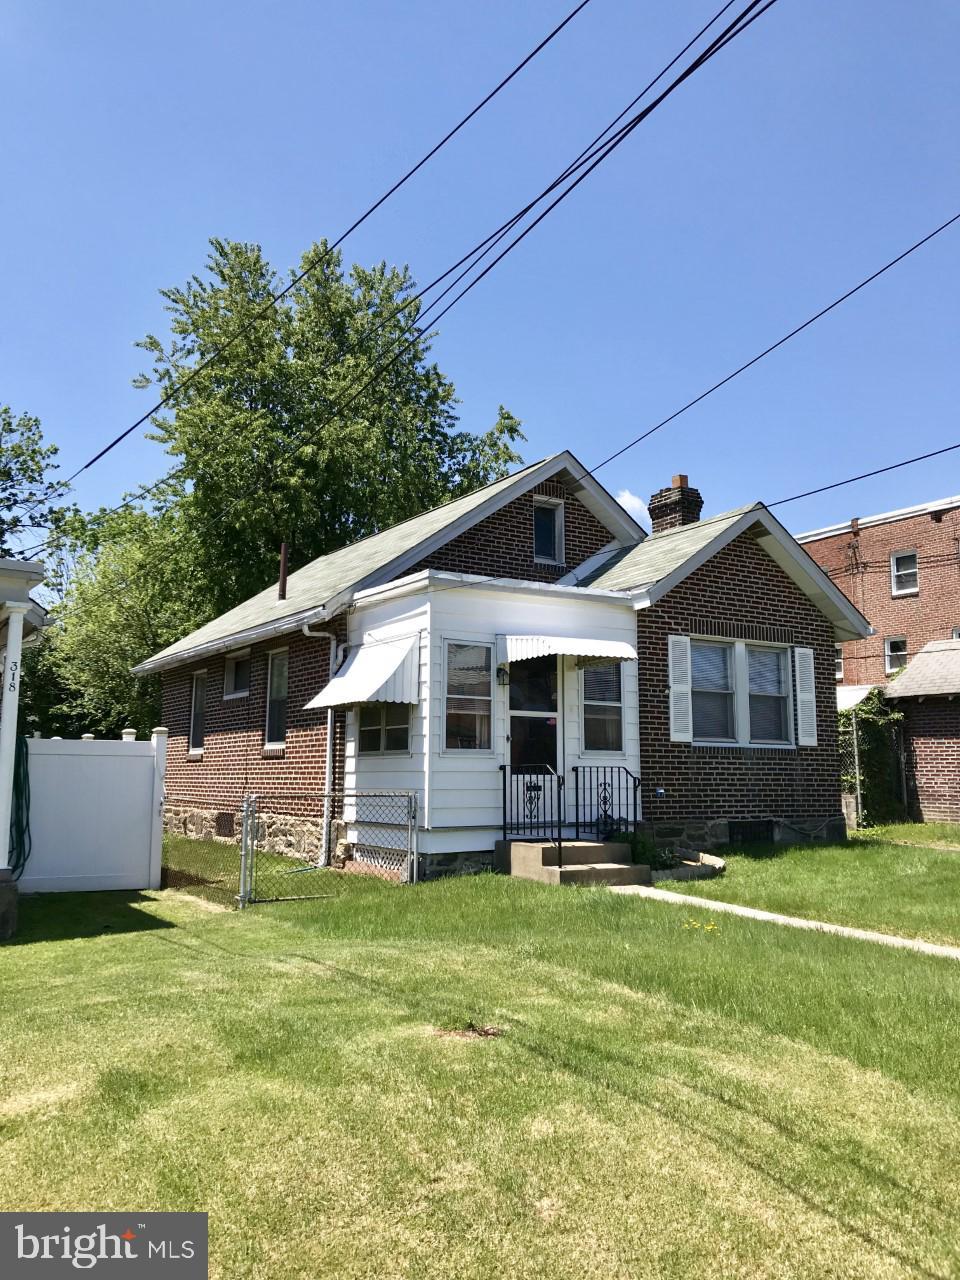 314 REESE STREET, SHARON HILL, PA 19079